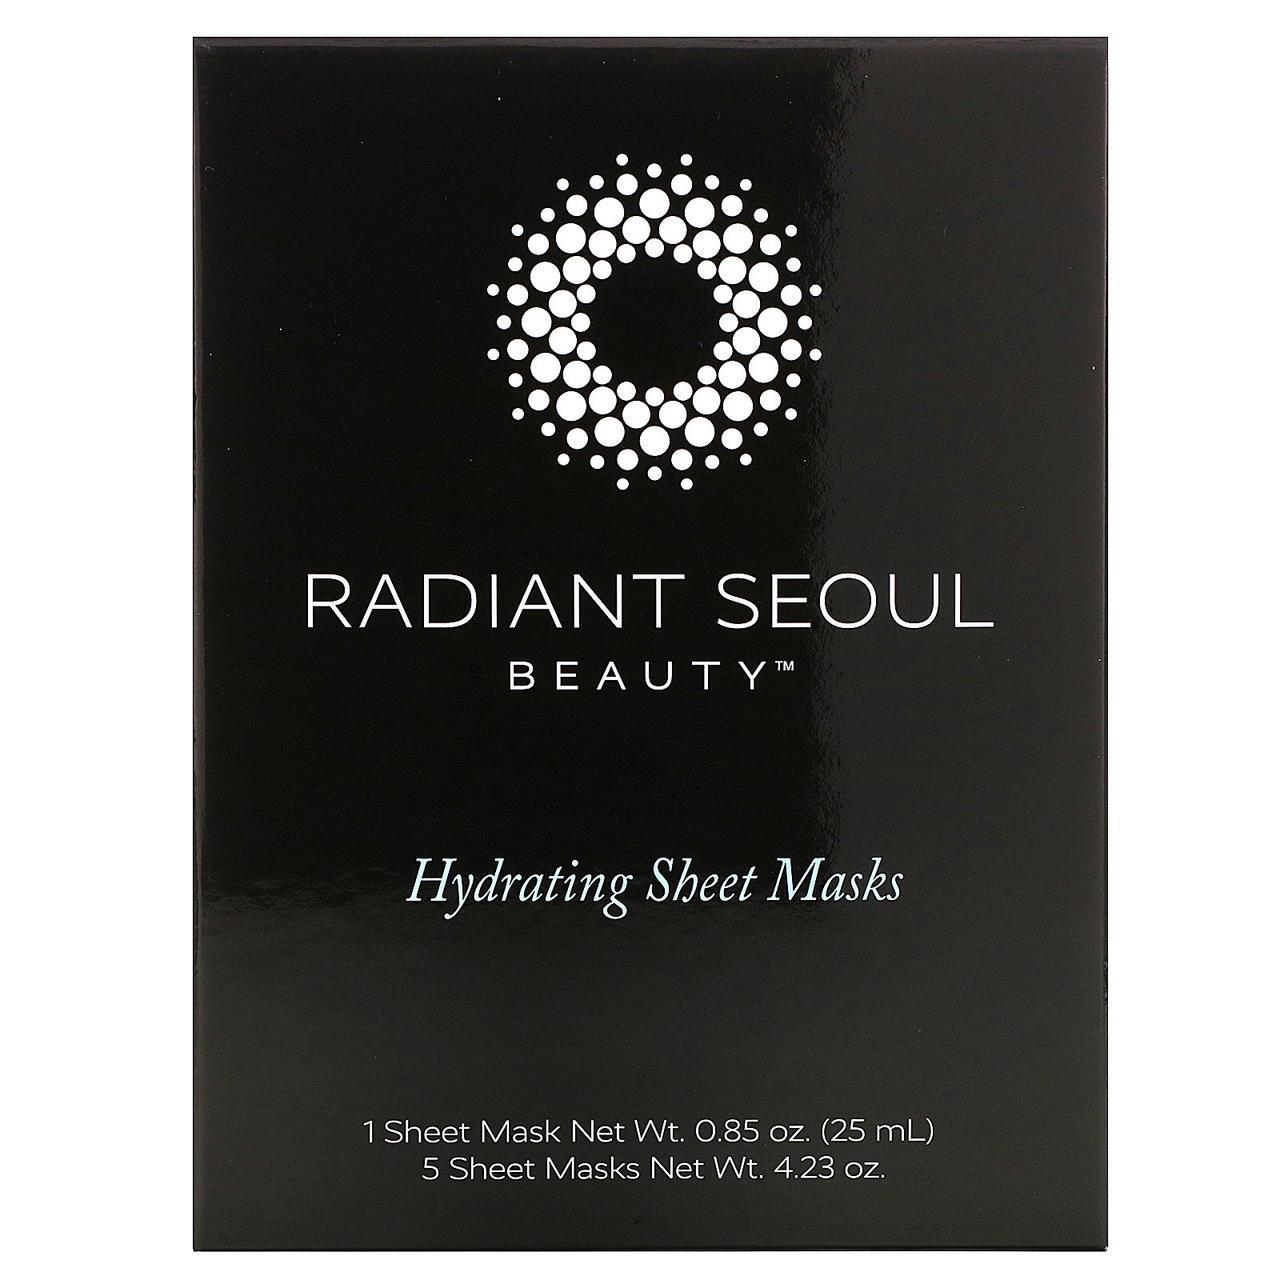 Зволожуюча тканинна маска, 5 шт. по 25 мл, Radiant Seoul